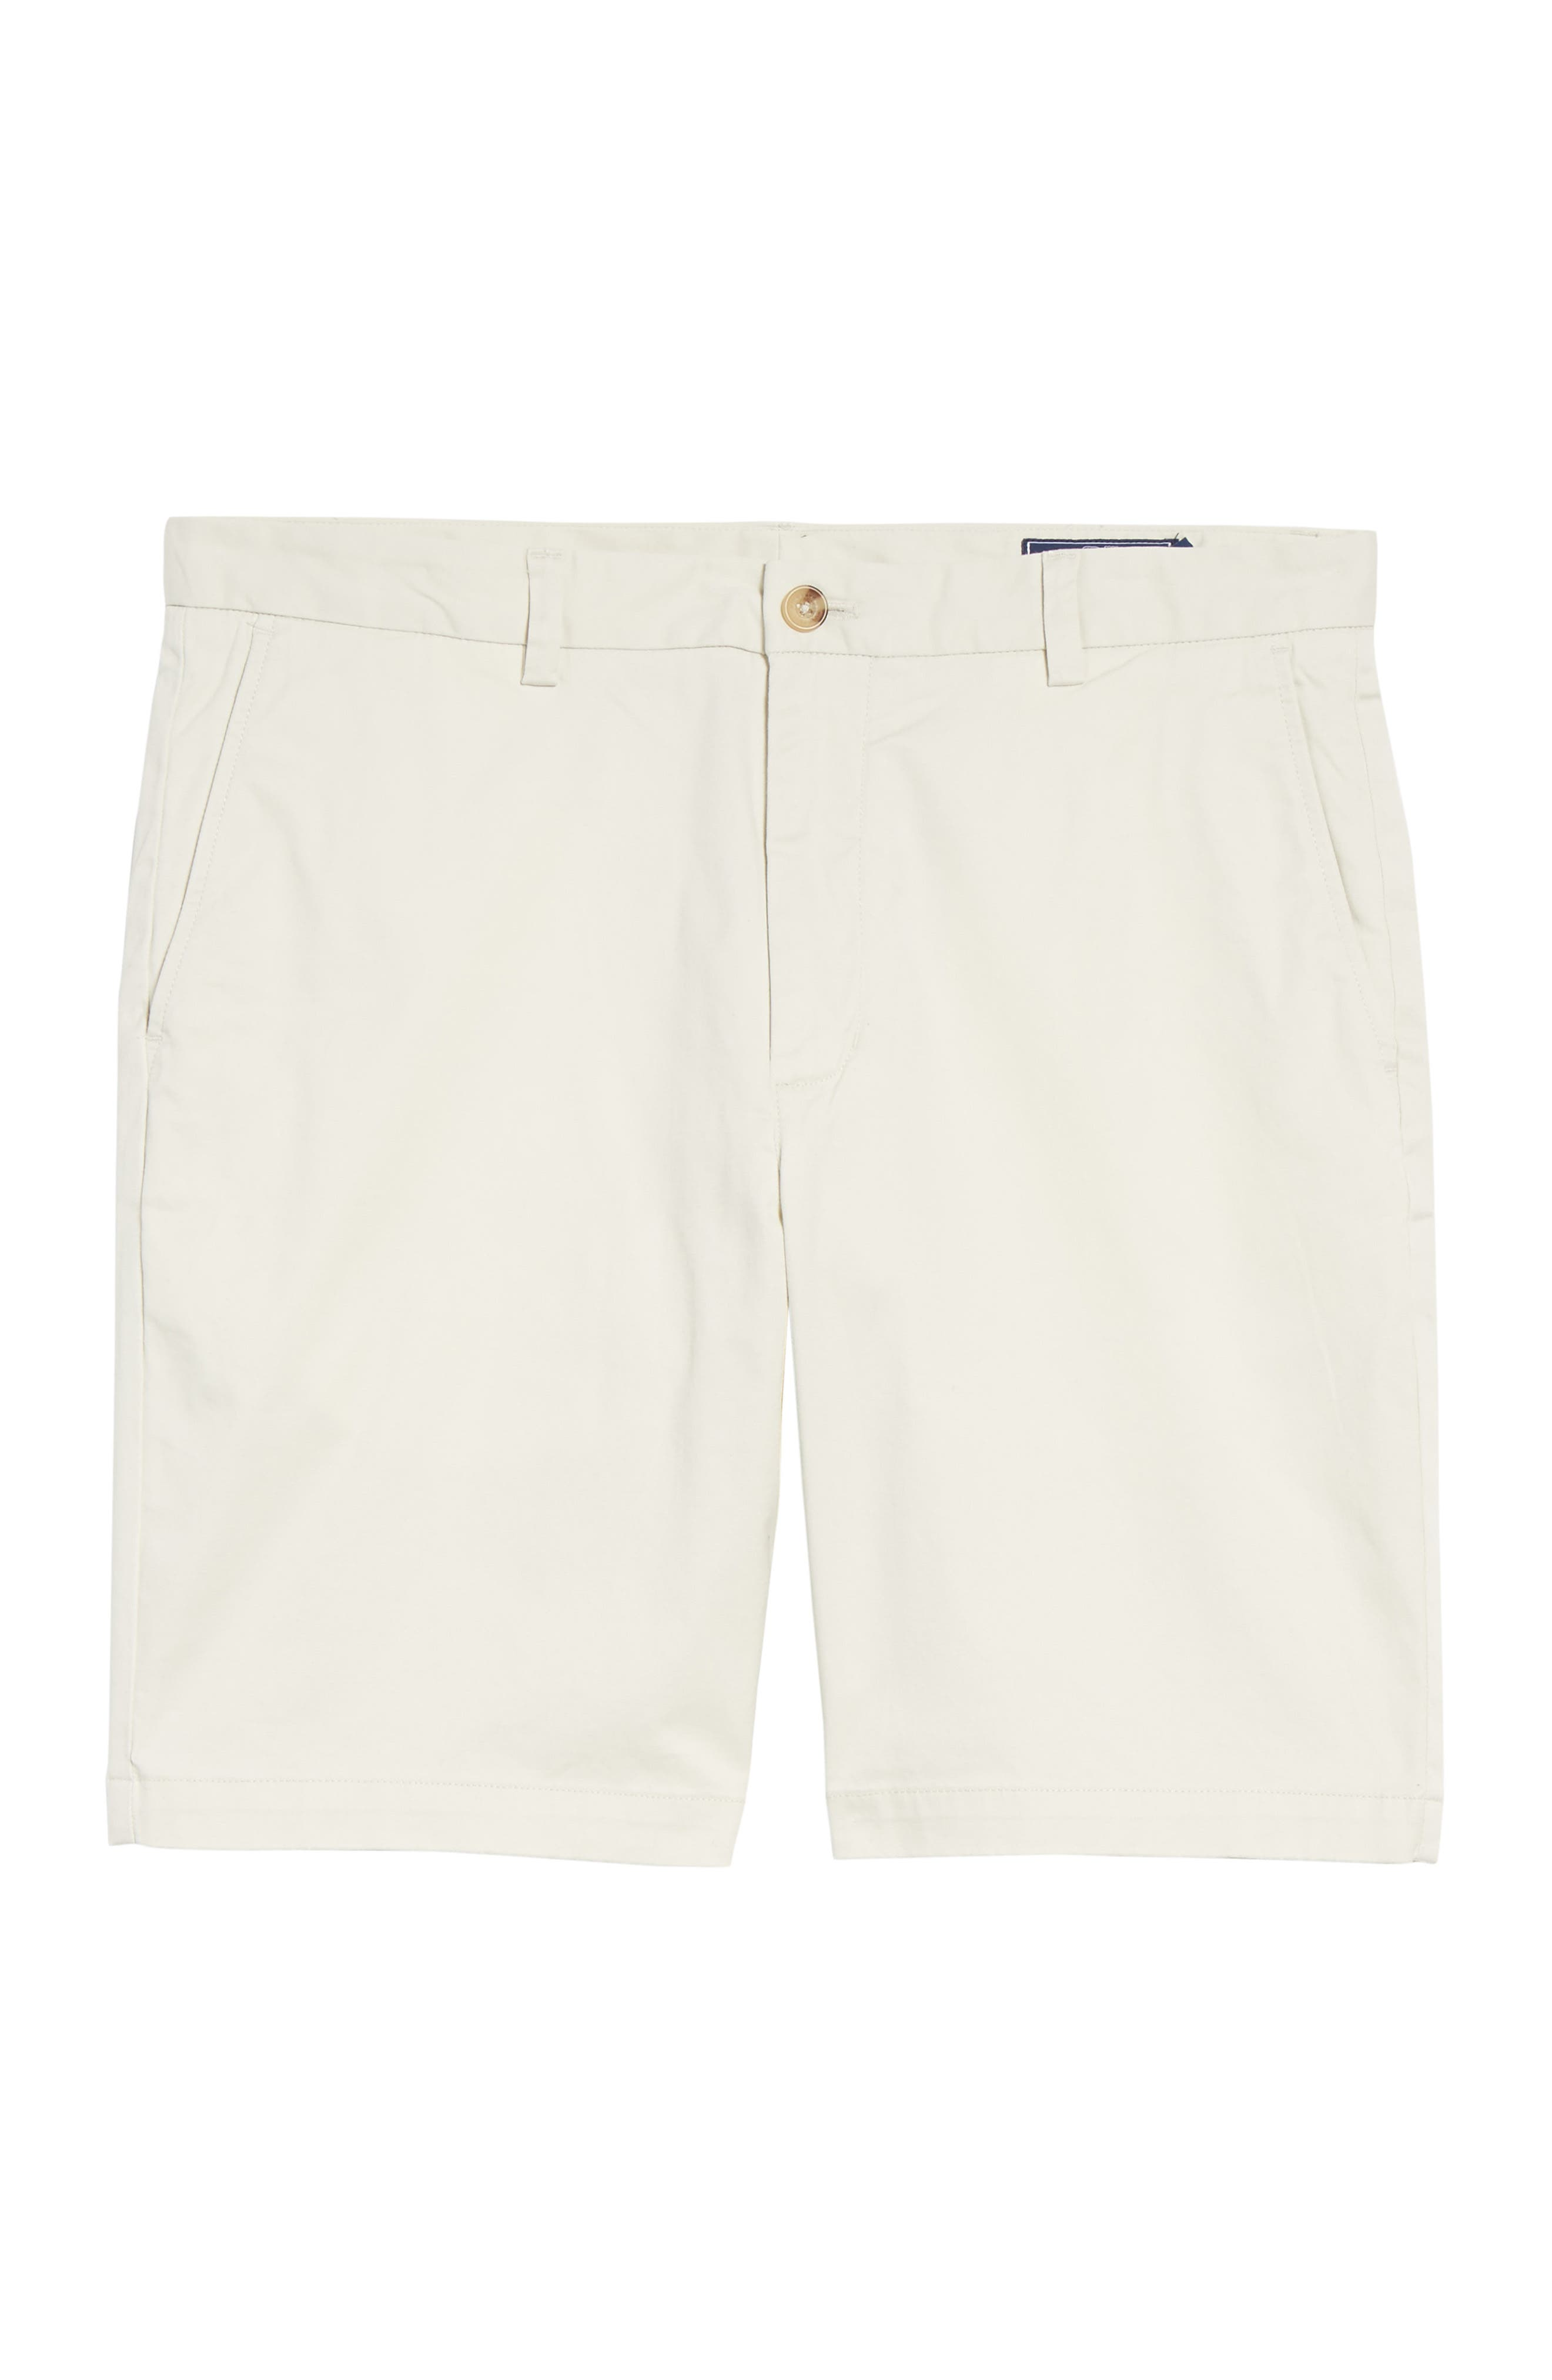 9 Inch Stretch Breaker Shorts,                             Alternate thumbnail 125, color,